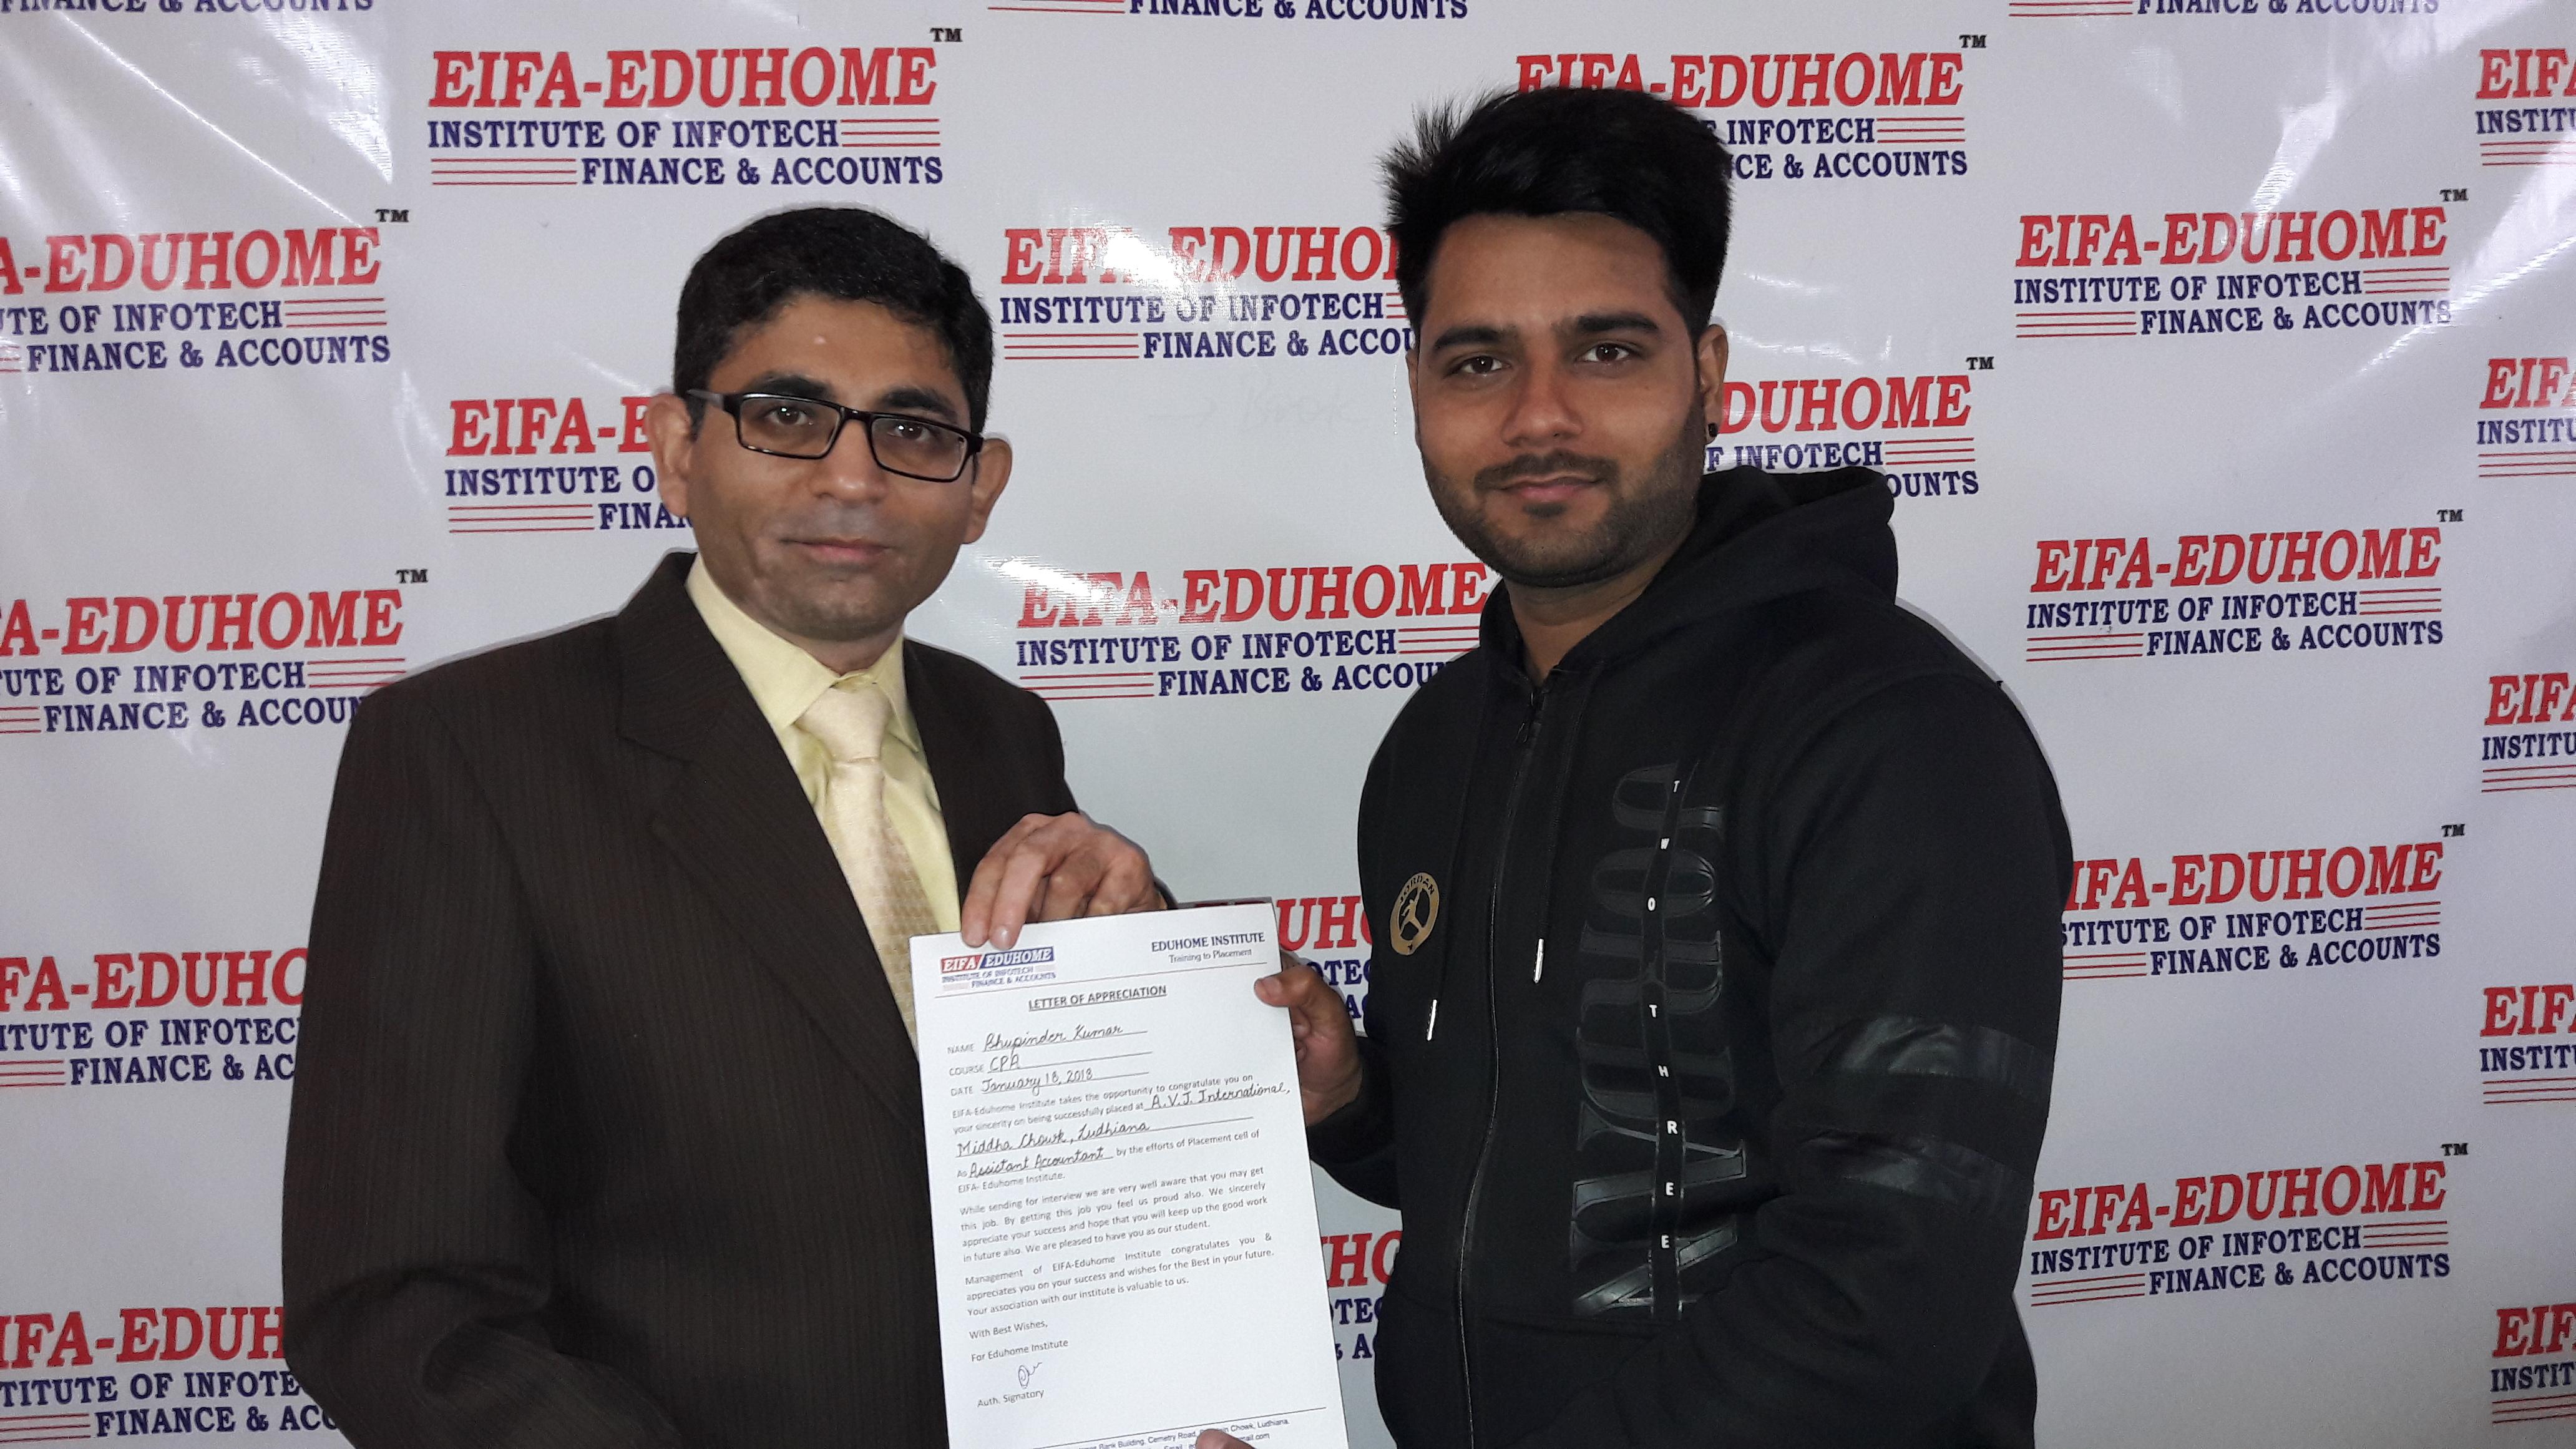 Bhupinder Kumar (A.V.J.International)